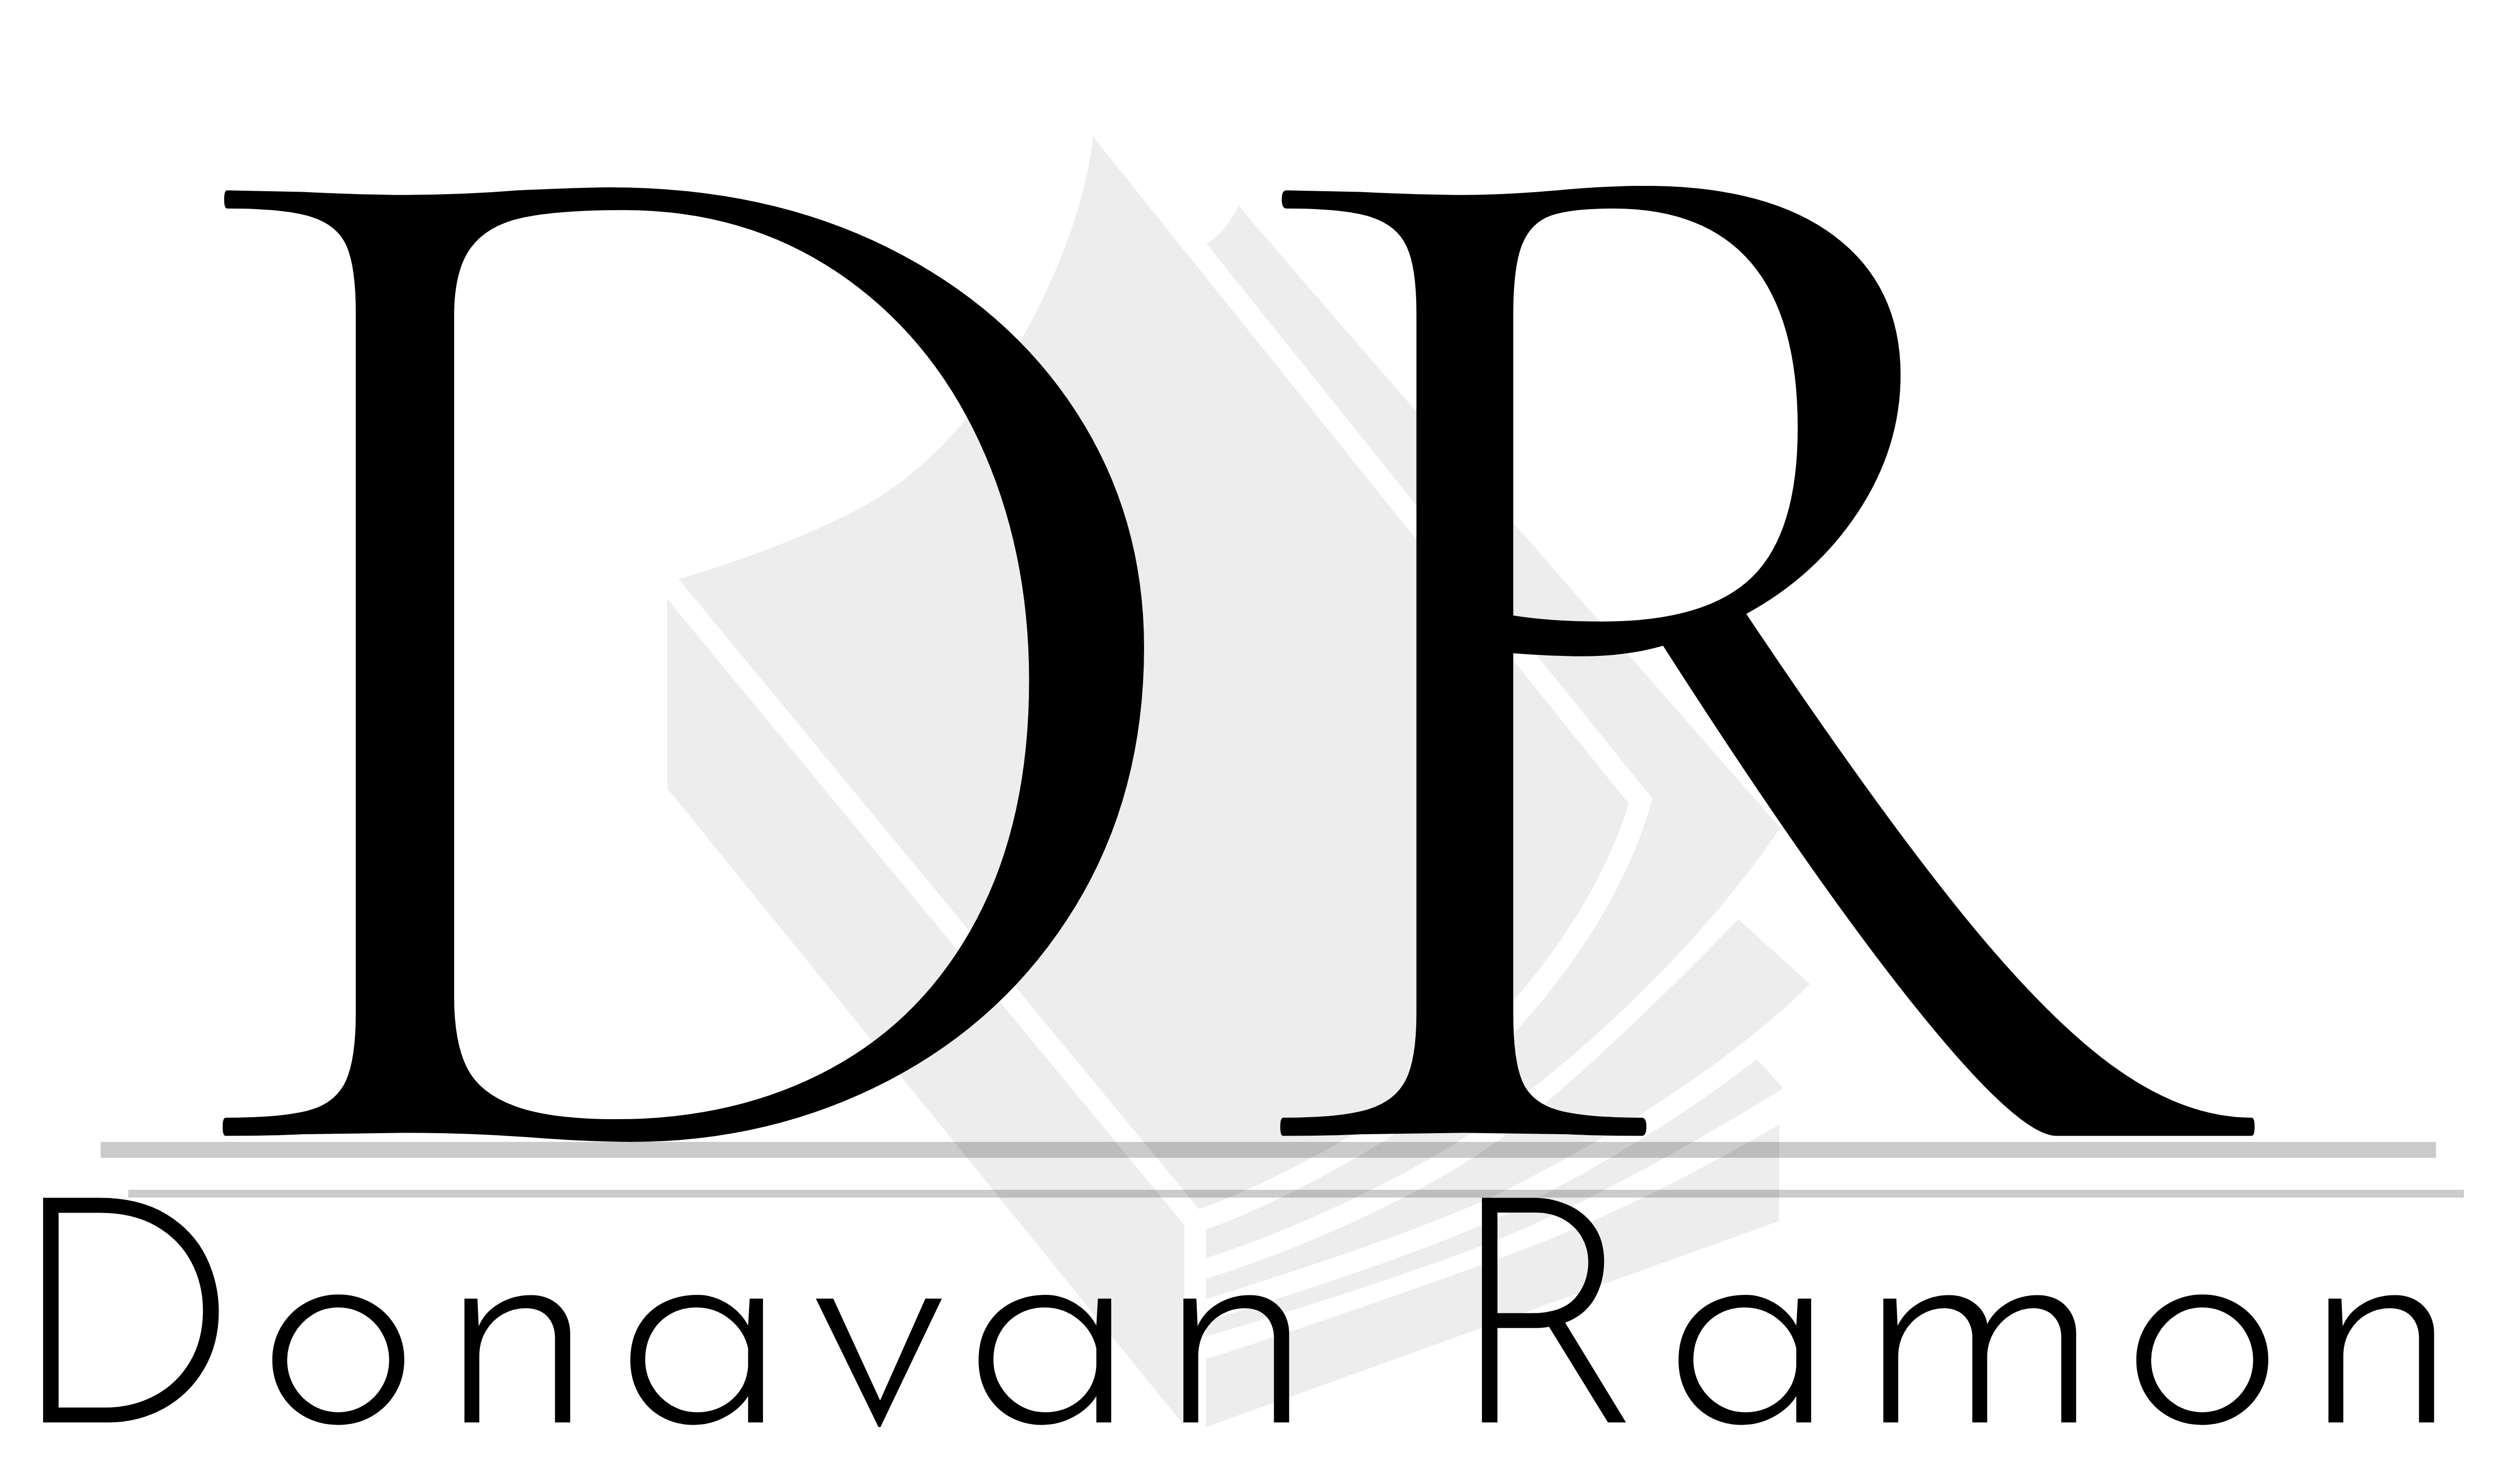 Donavan Ramon